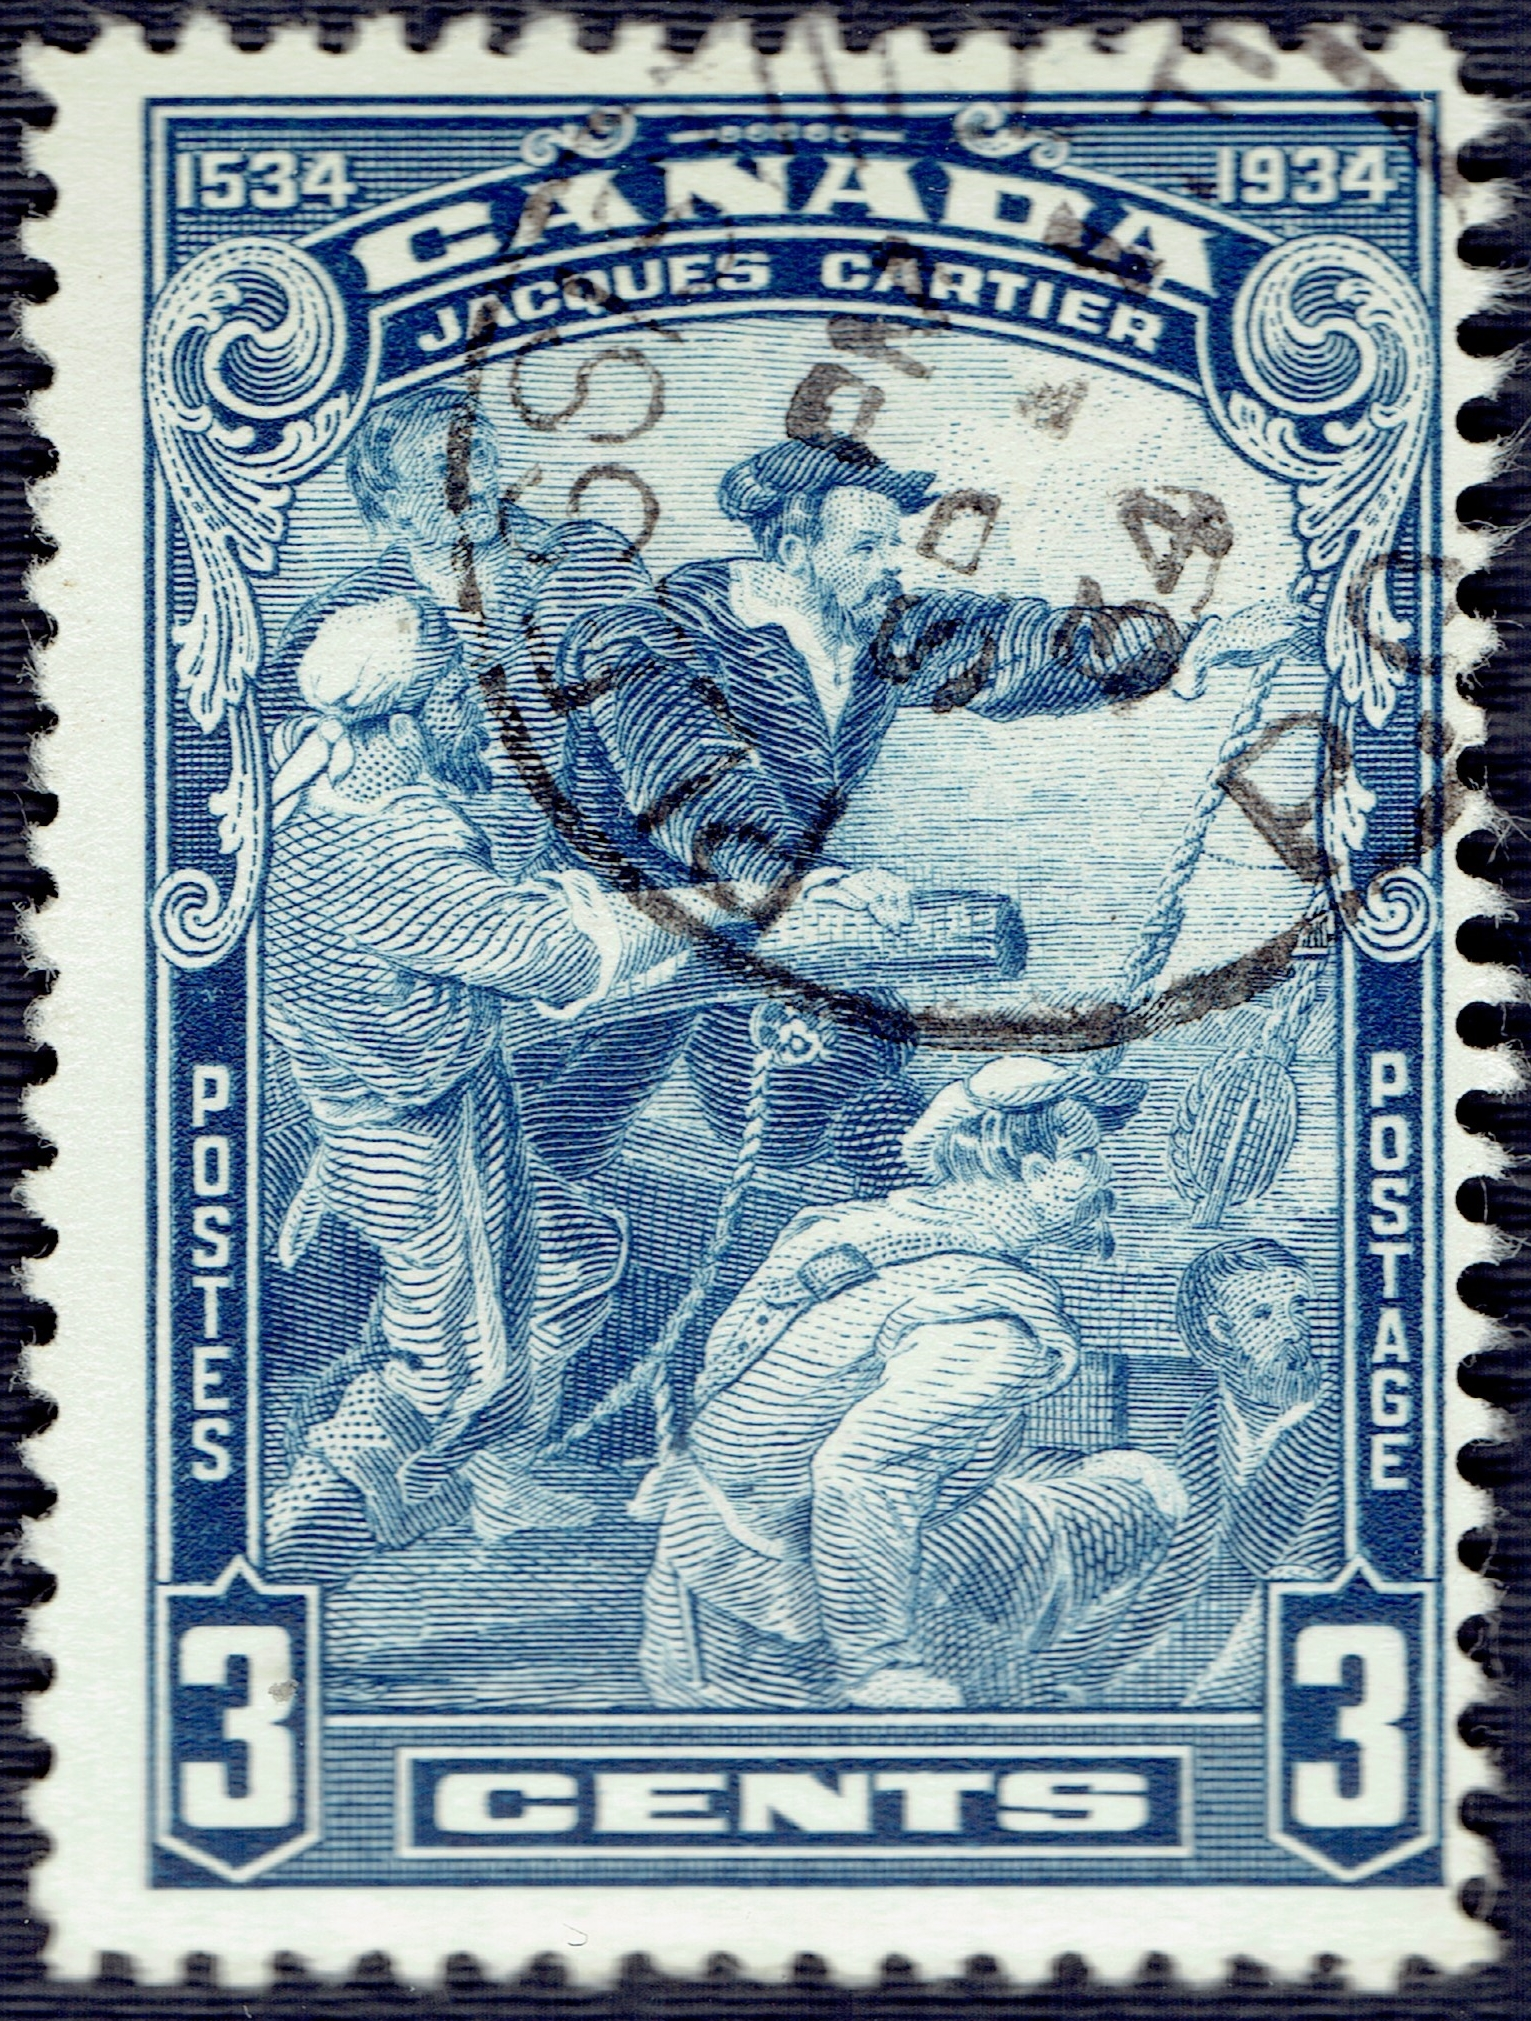 Canada - Scott #208 (1934)